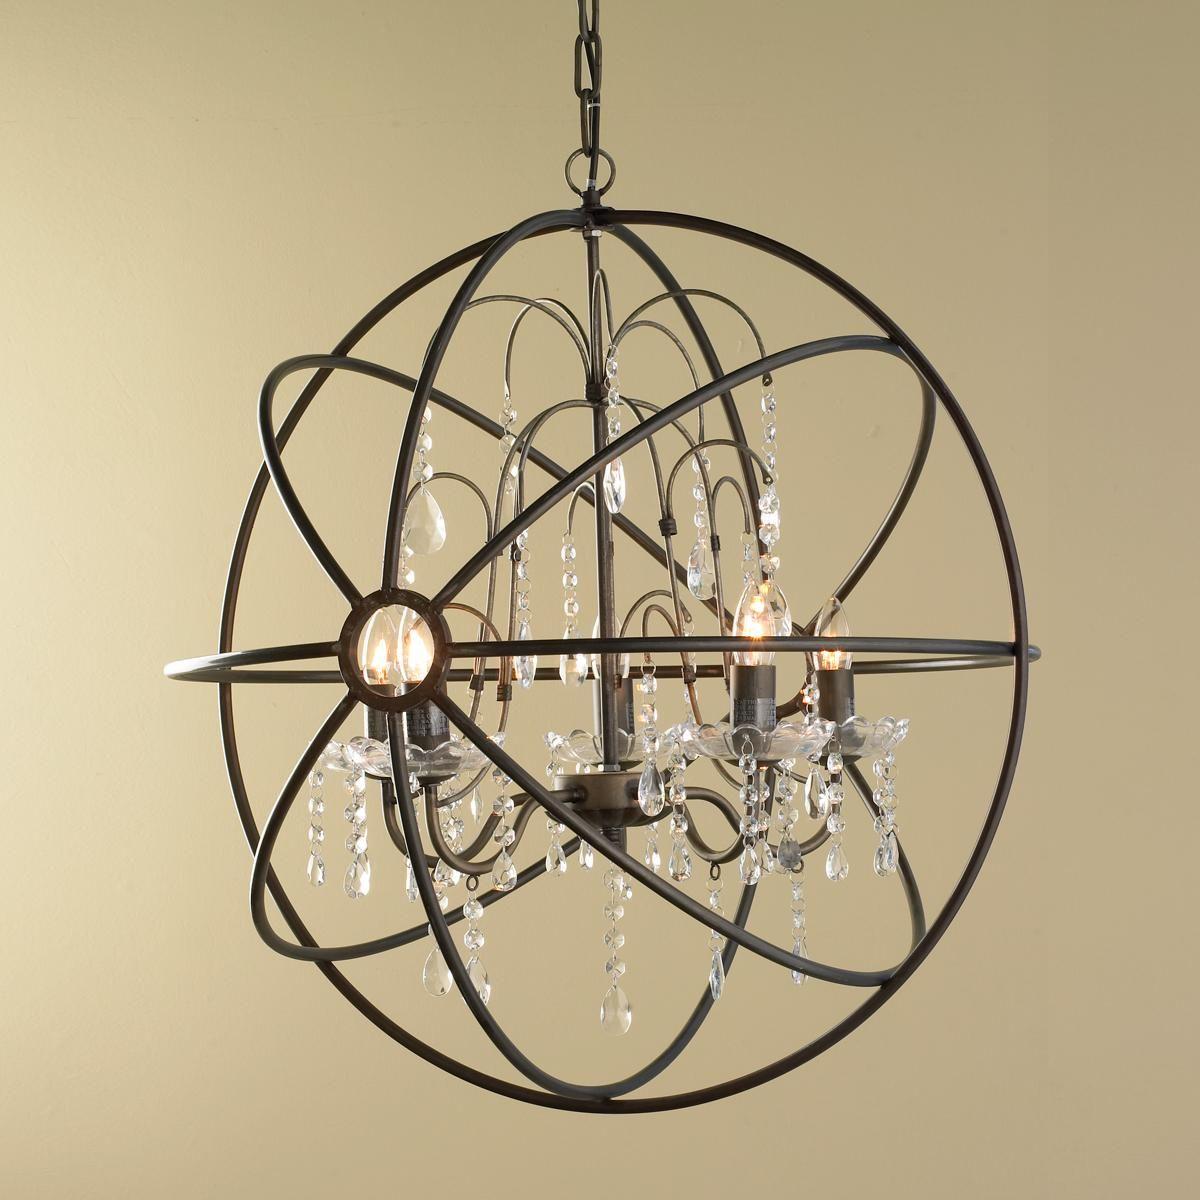 Modern Chandelier Globe 4 Light Metal Ceiling Fixture Round Orb Crystal Lighting